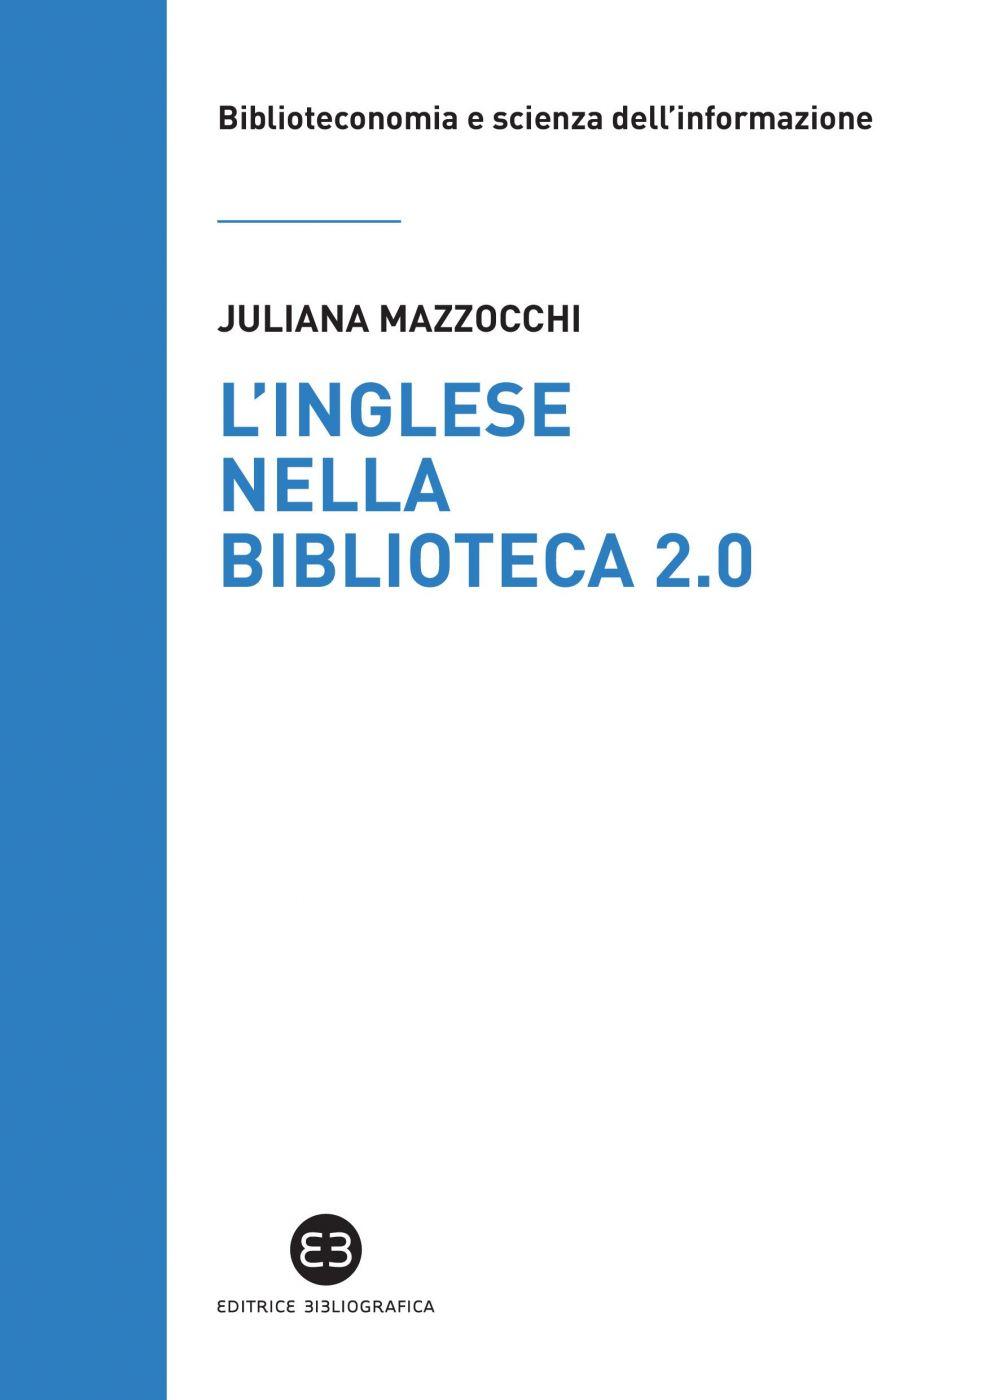 L'inglese nella biblioteca 2.0